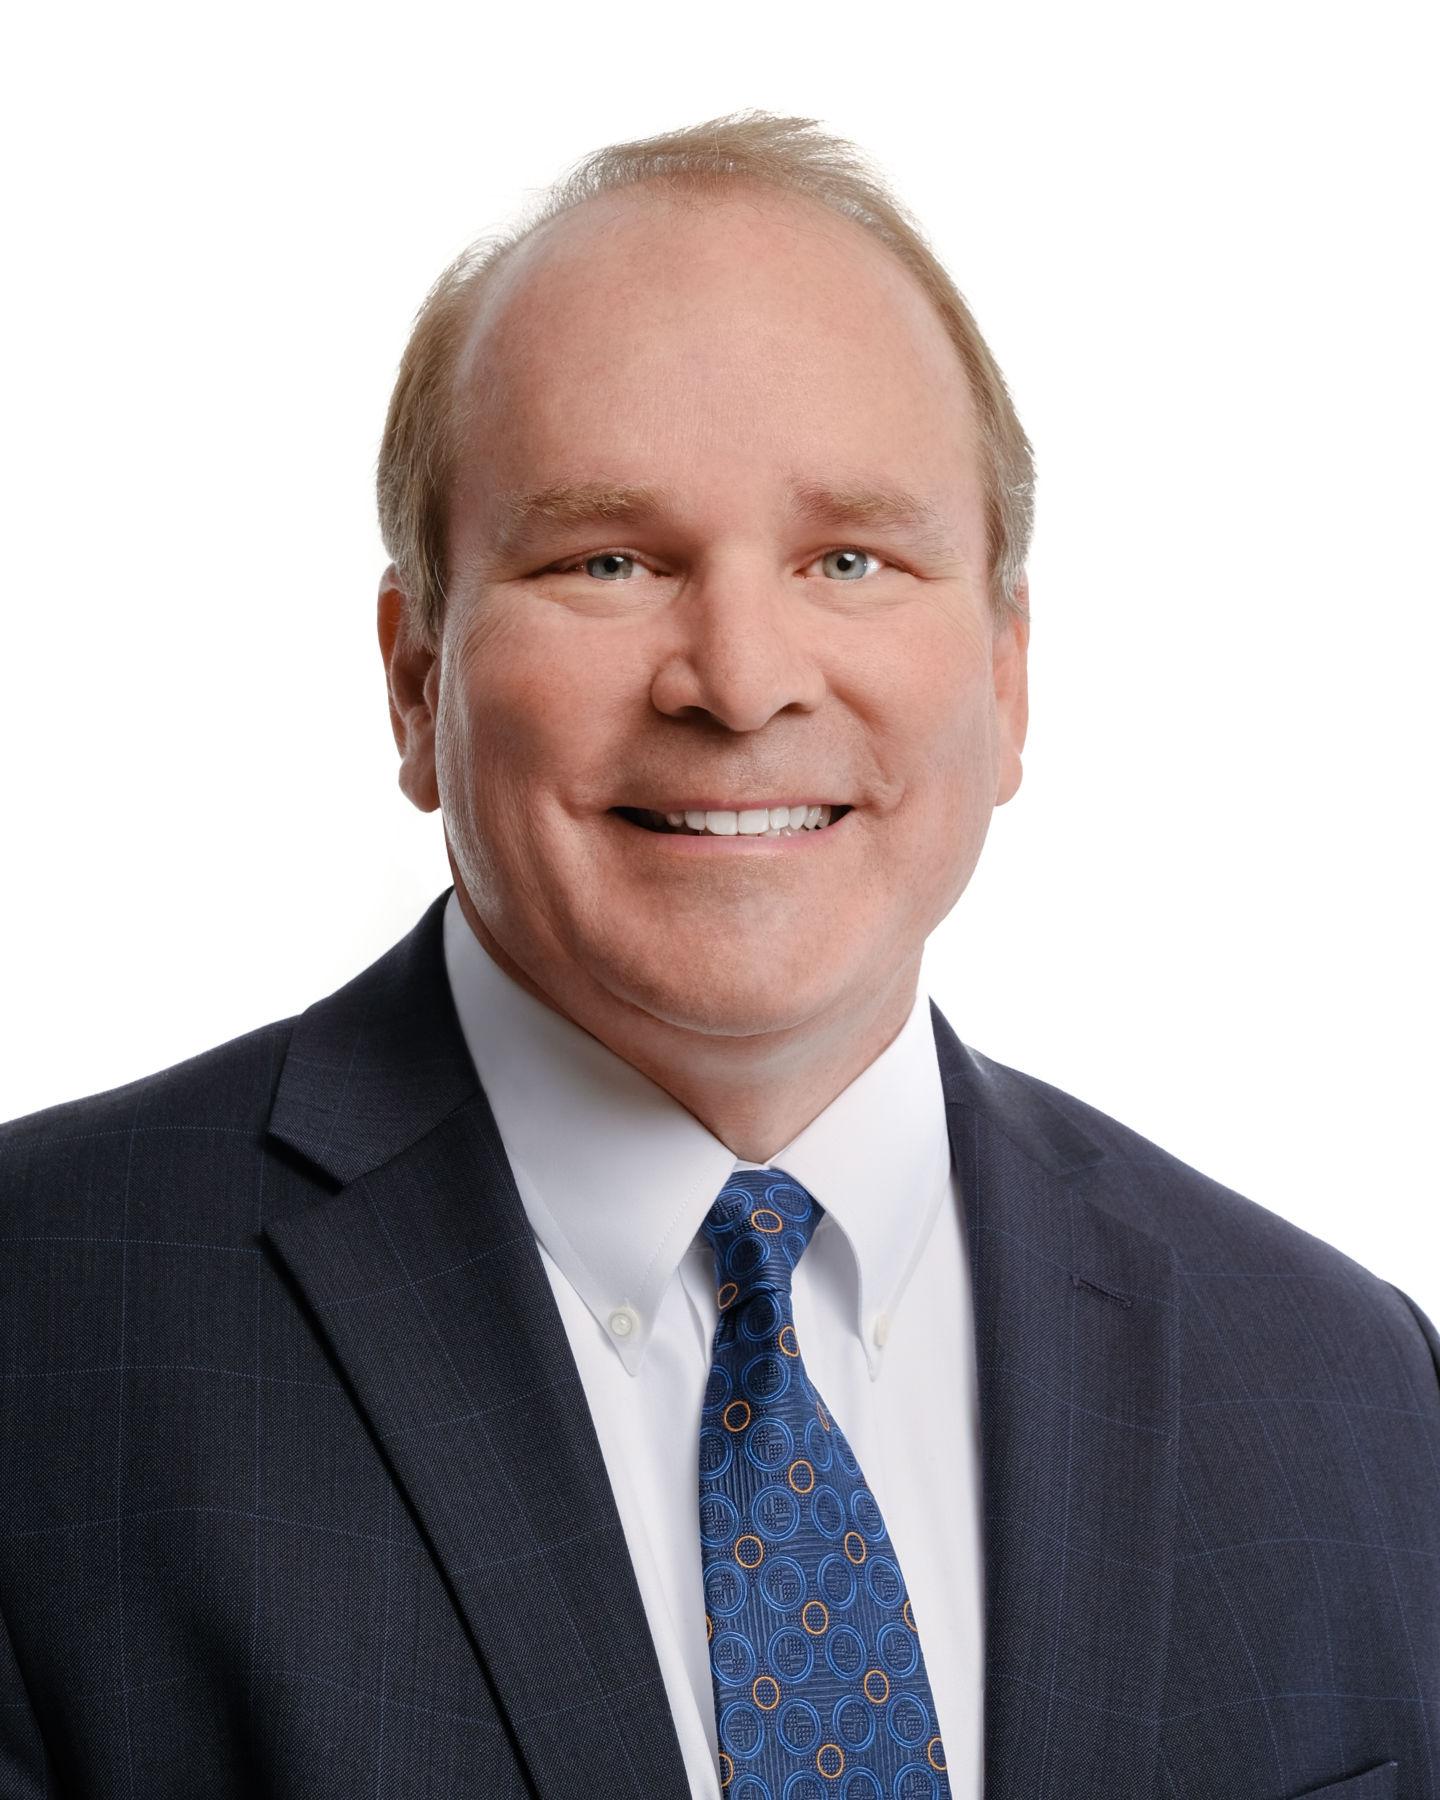 Michael P. Gruber, M.D.